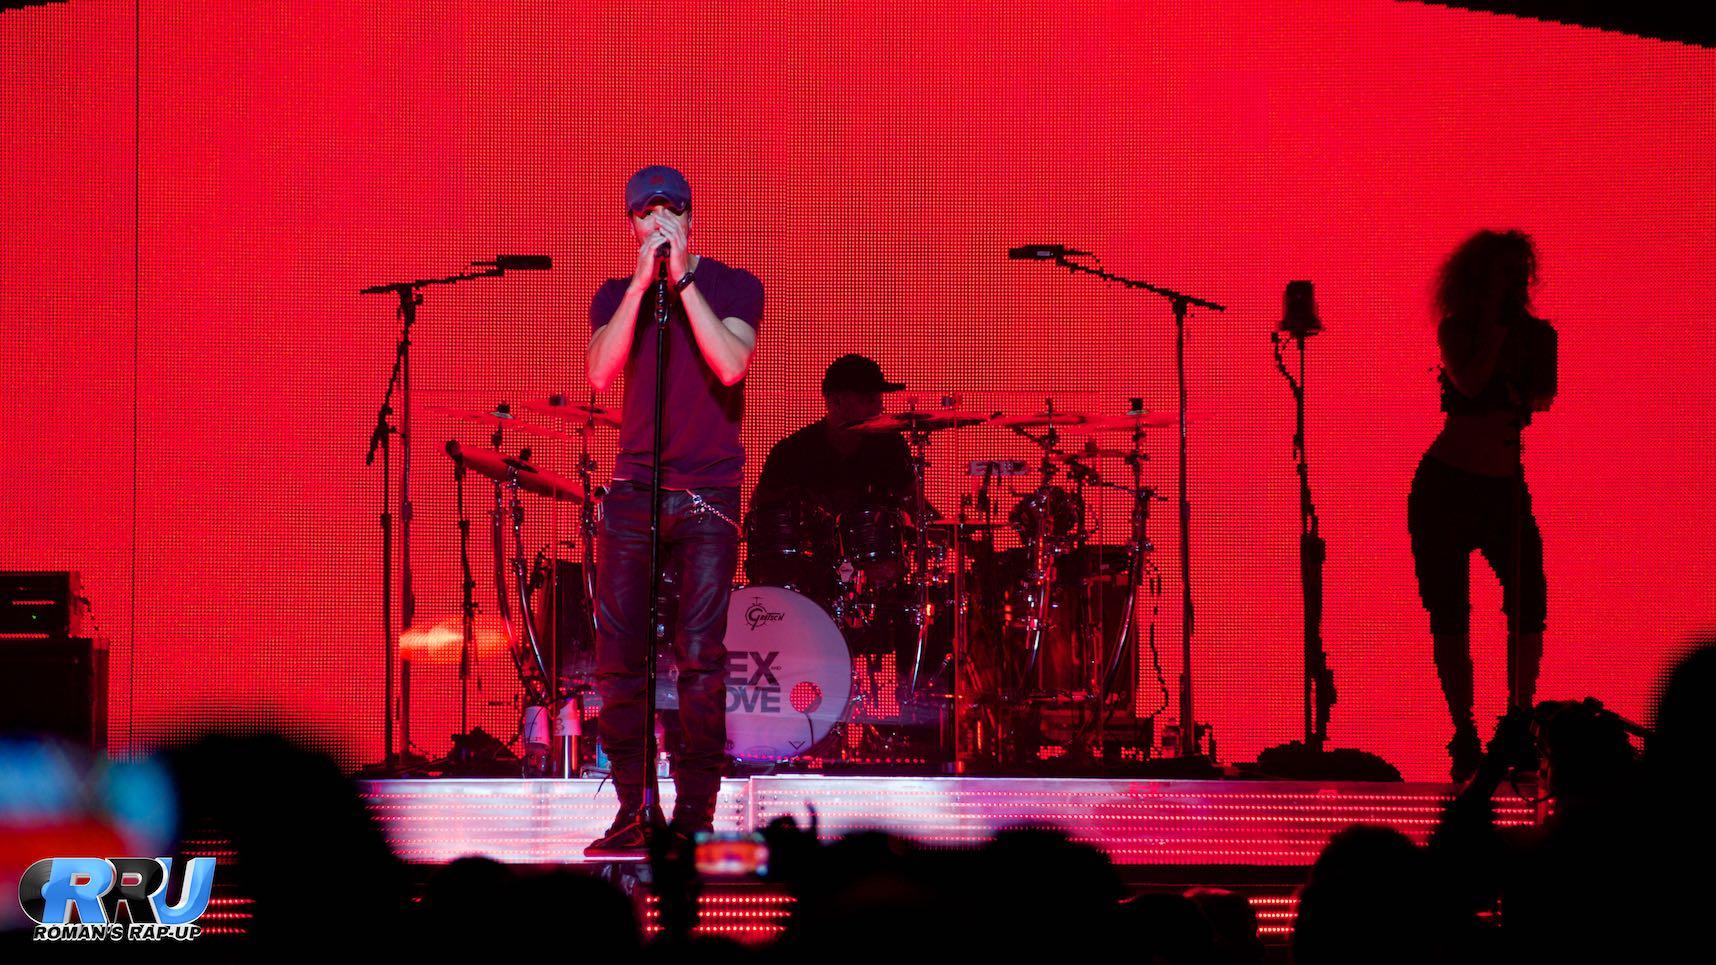 Enrique Iglesias performs in Boston, MA on September 29th, 2014 (Benjamin Esakof/Roman's Rap-Up).